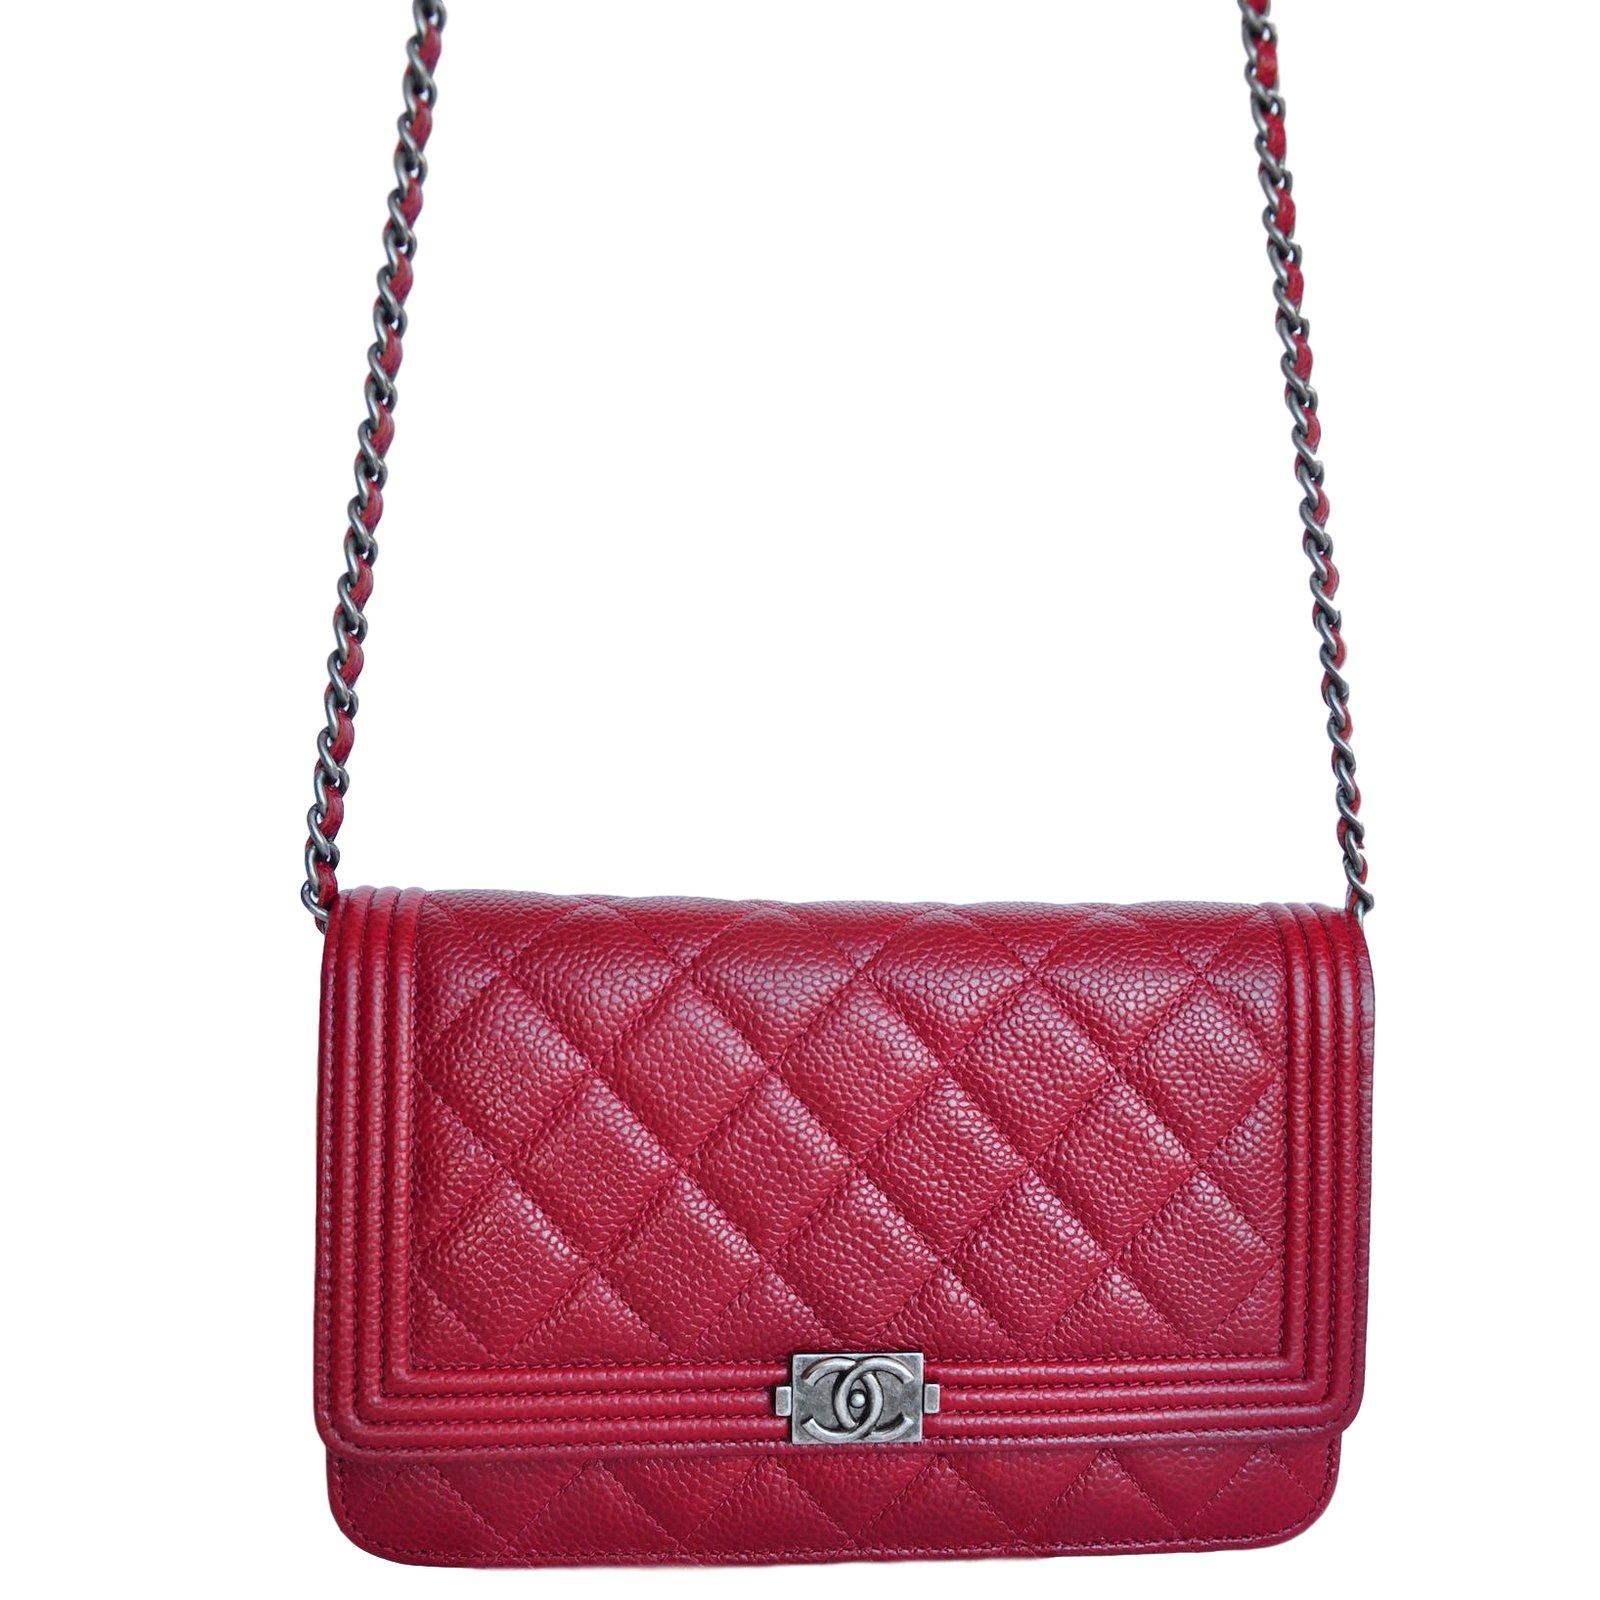 48a43c8208ff Chanel WOC Wallet On Chain Clutch bags Leather Dark red ref.17444 - Joli  Closet